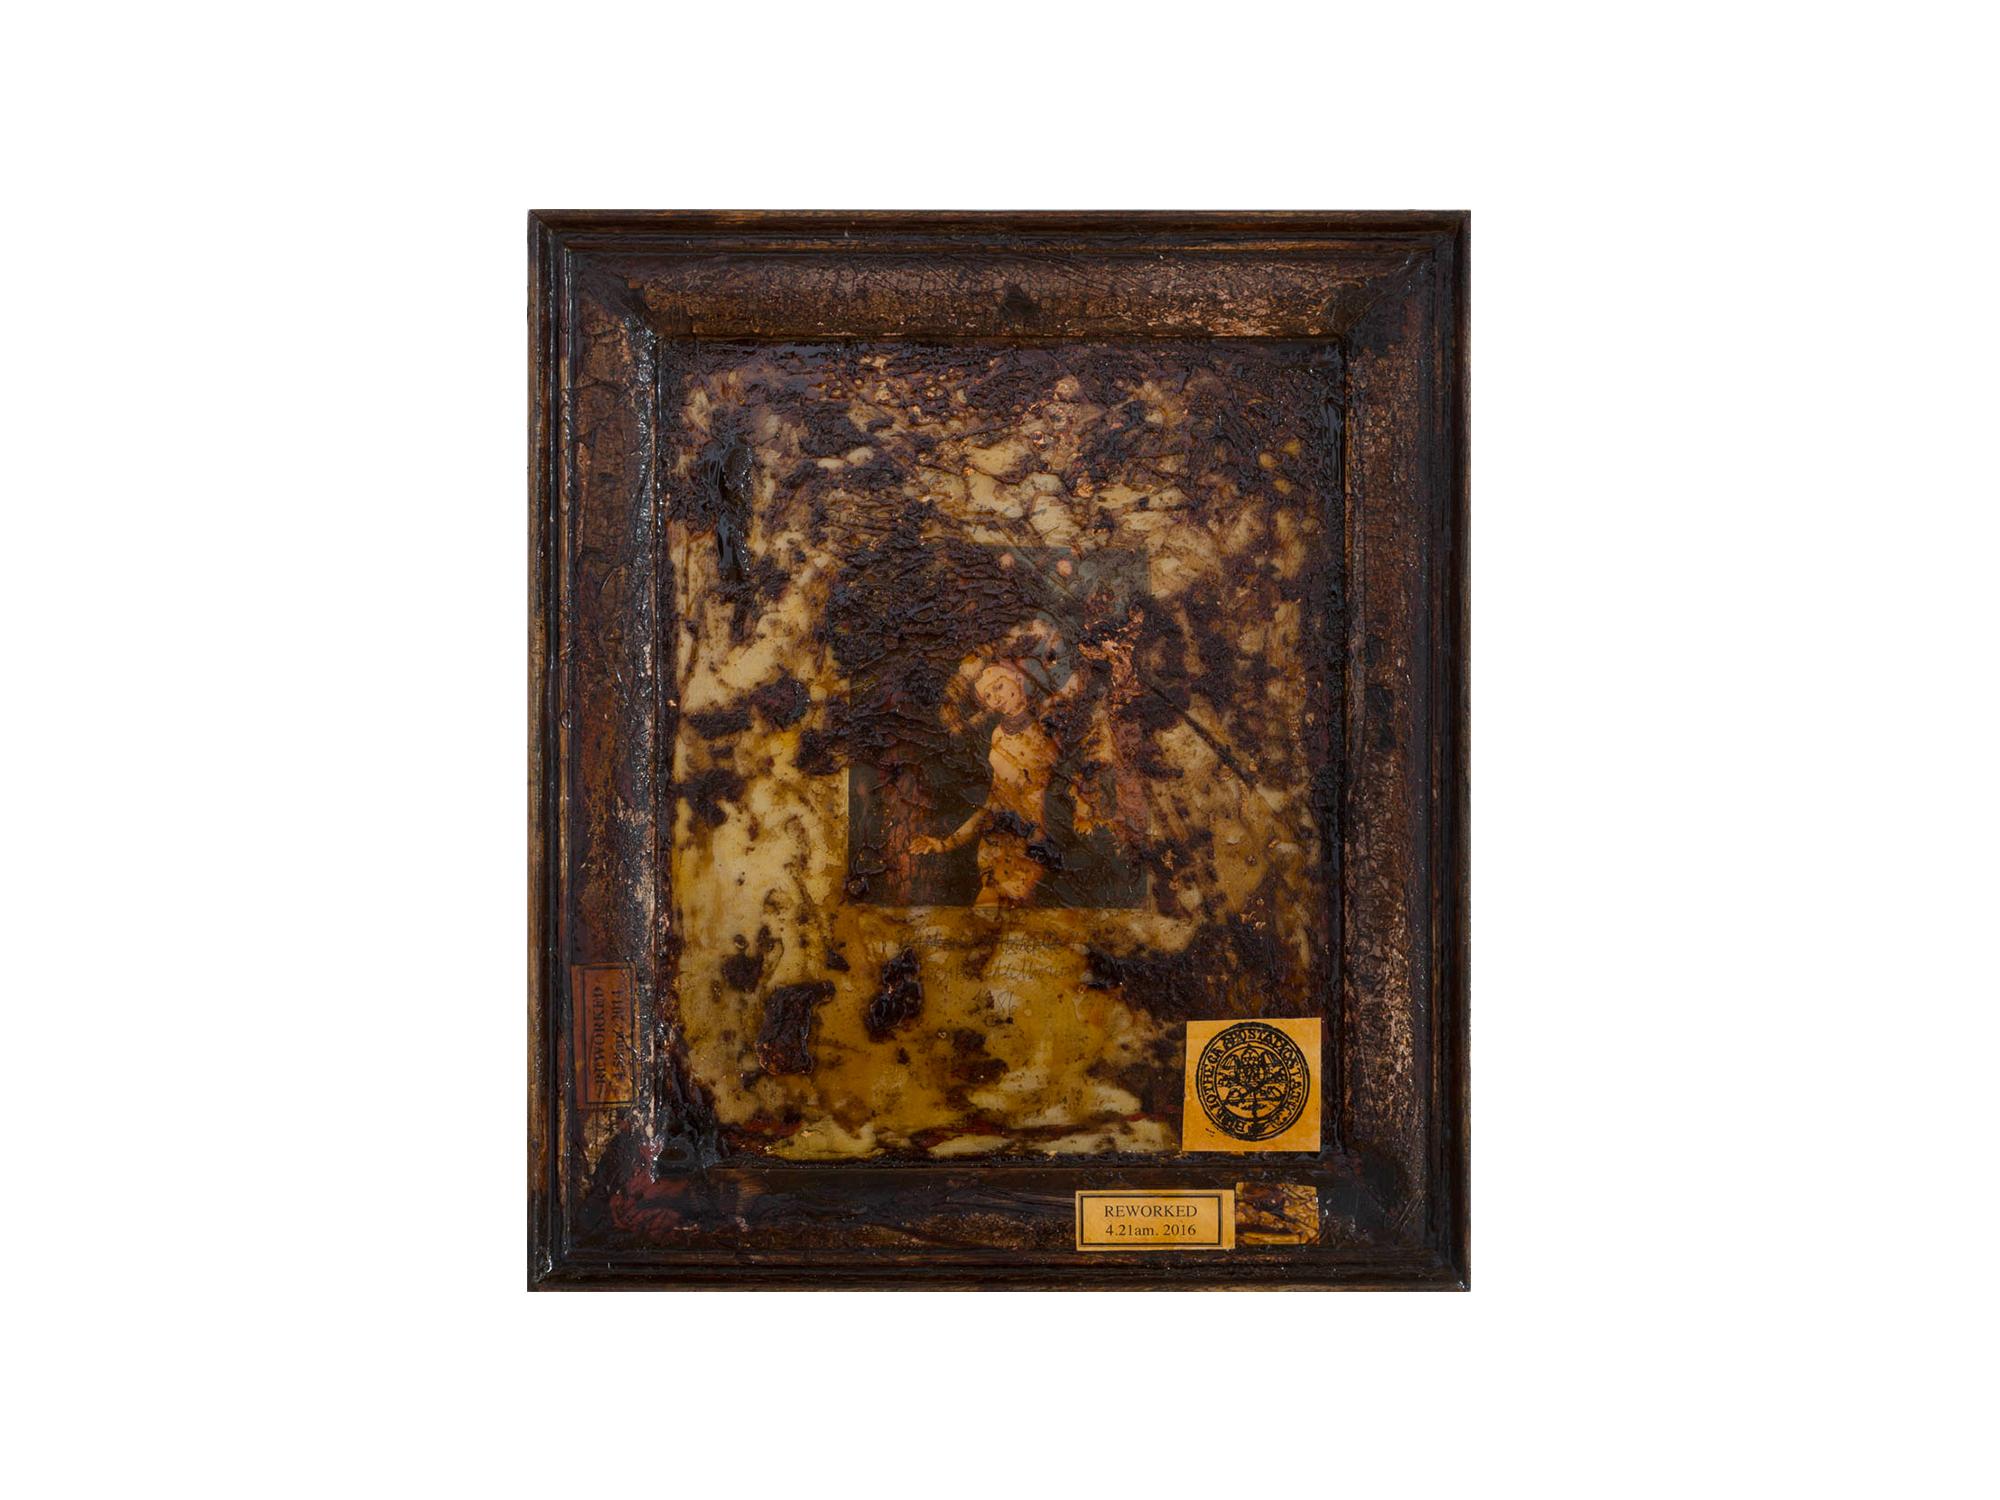 Bernard Sachs   Honey Thieves (detail after Cranach) , 2016 print and mixed media on framed card 38 x 33cm   ARTIST BIO